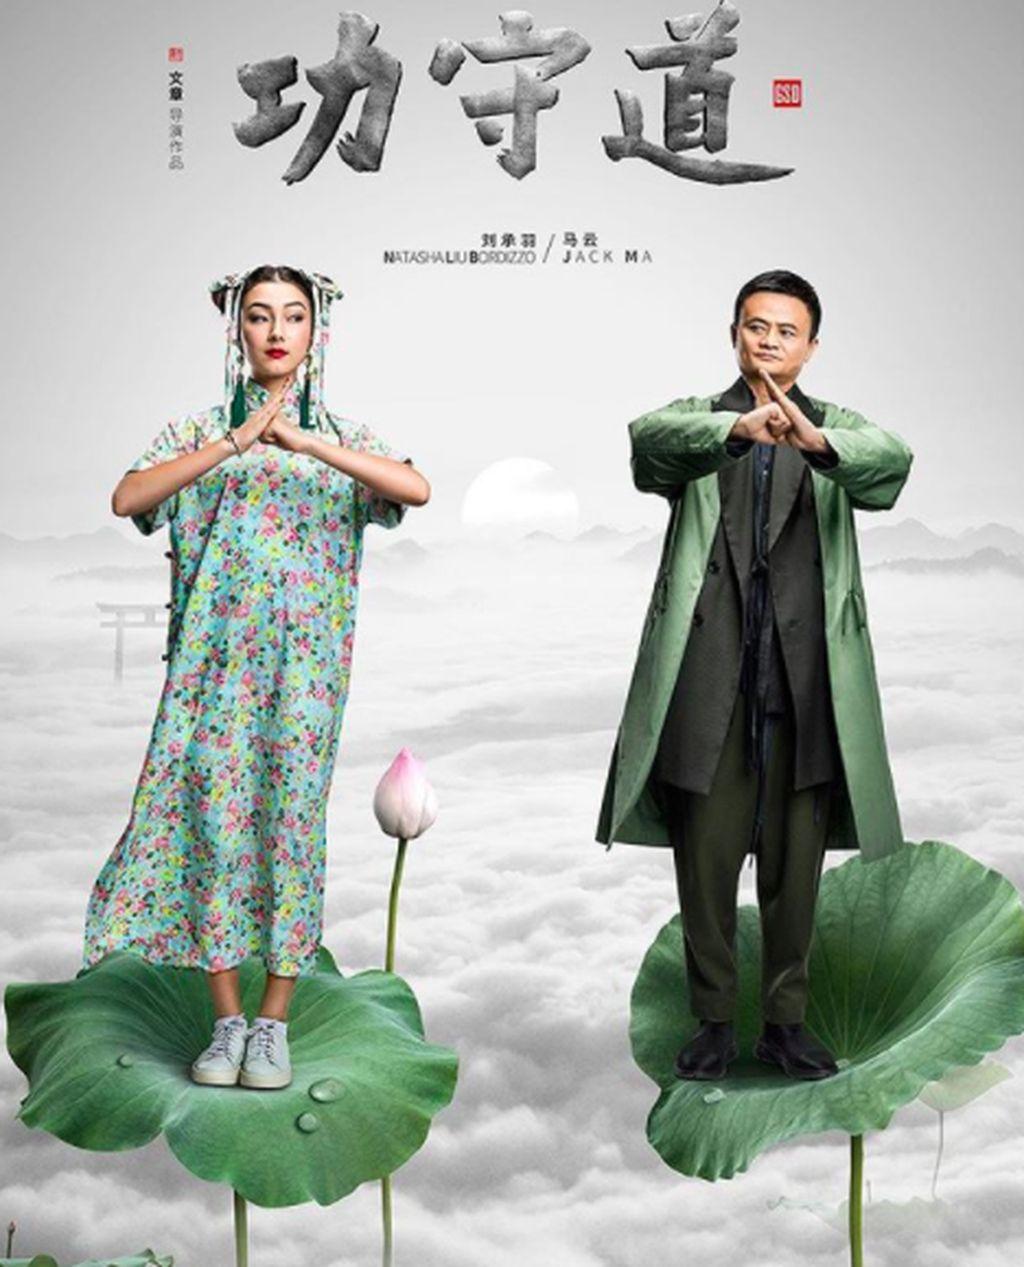 Pendiri raksasa e-commerce Alibaba, Jack Ma, untuk pertama kalinya akan bermain film layar lebar. Salah satu lawan mainnya adalah aktris bernama Natasha Liu ini. Foto: Instagram